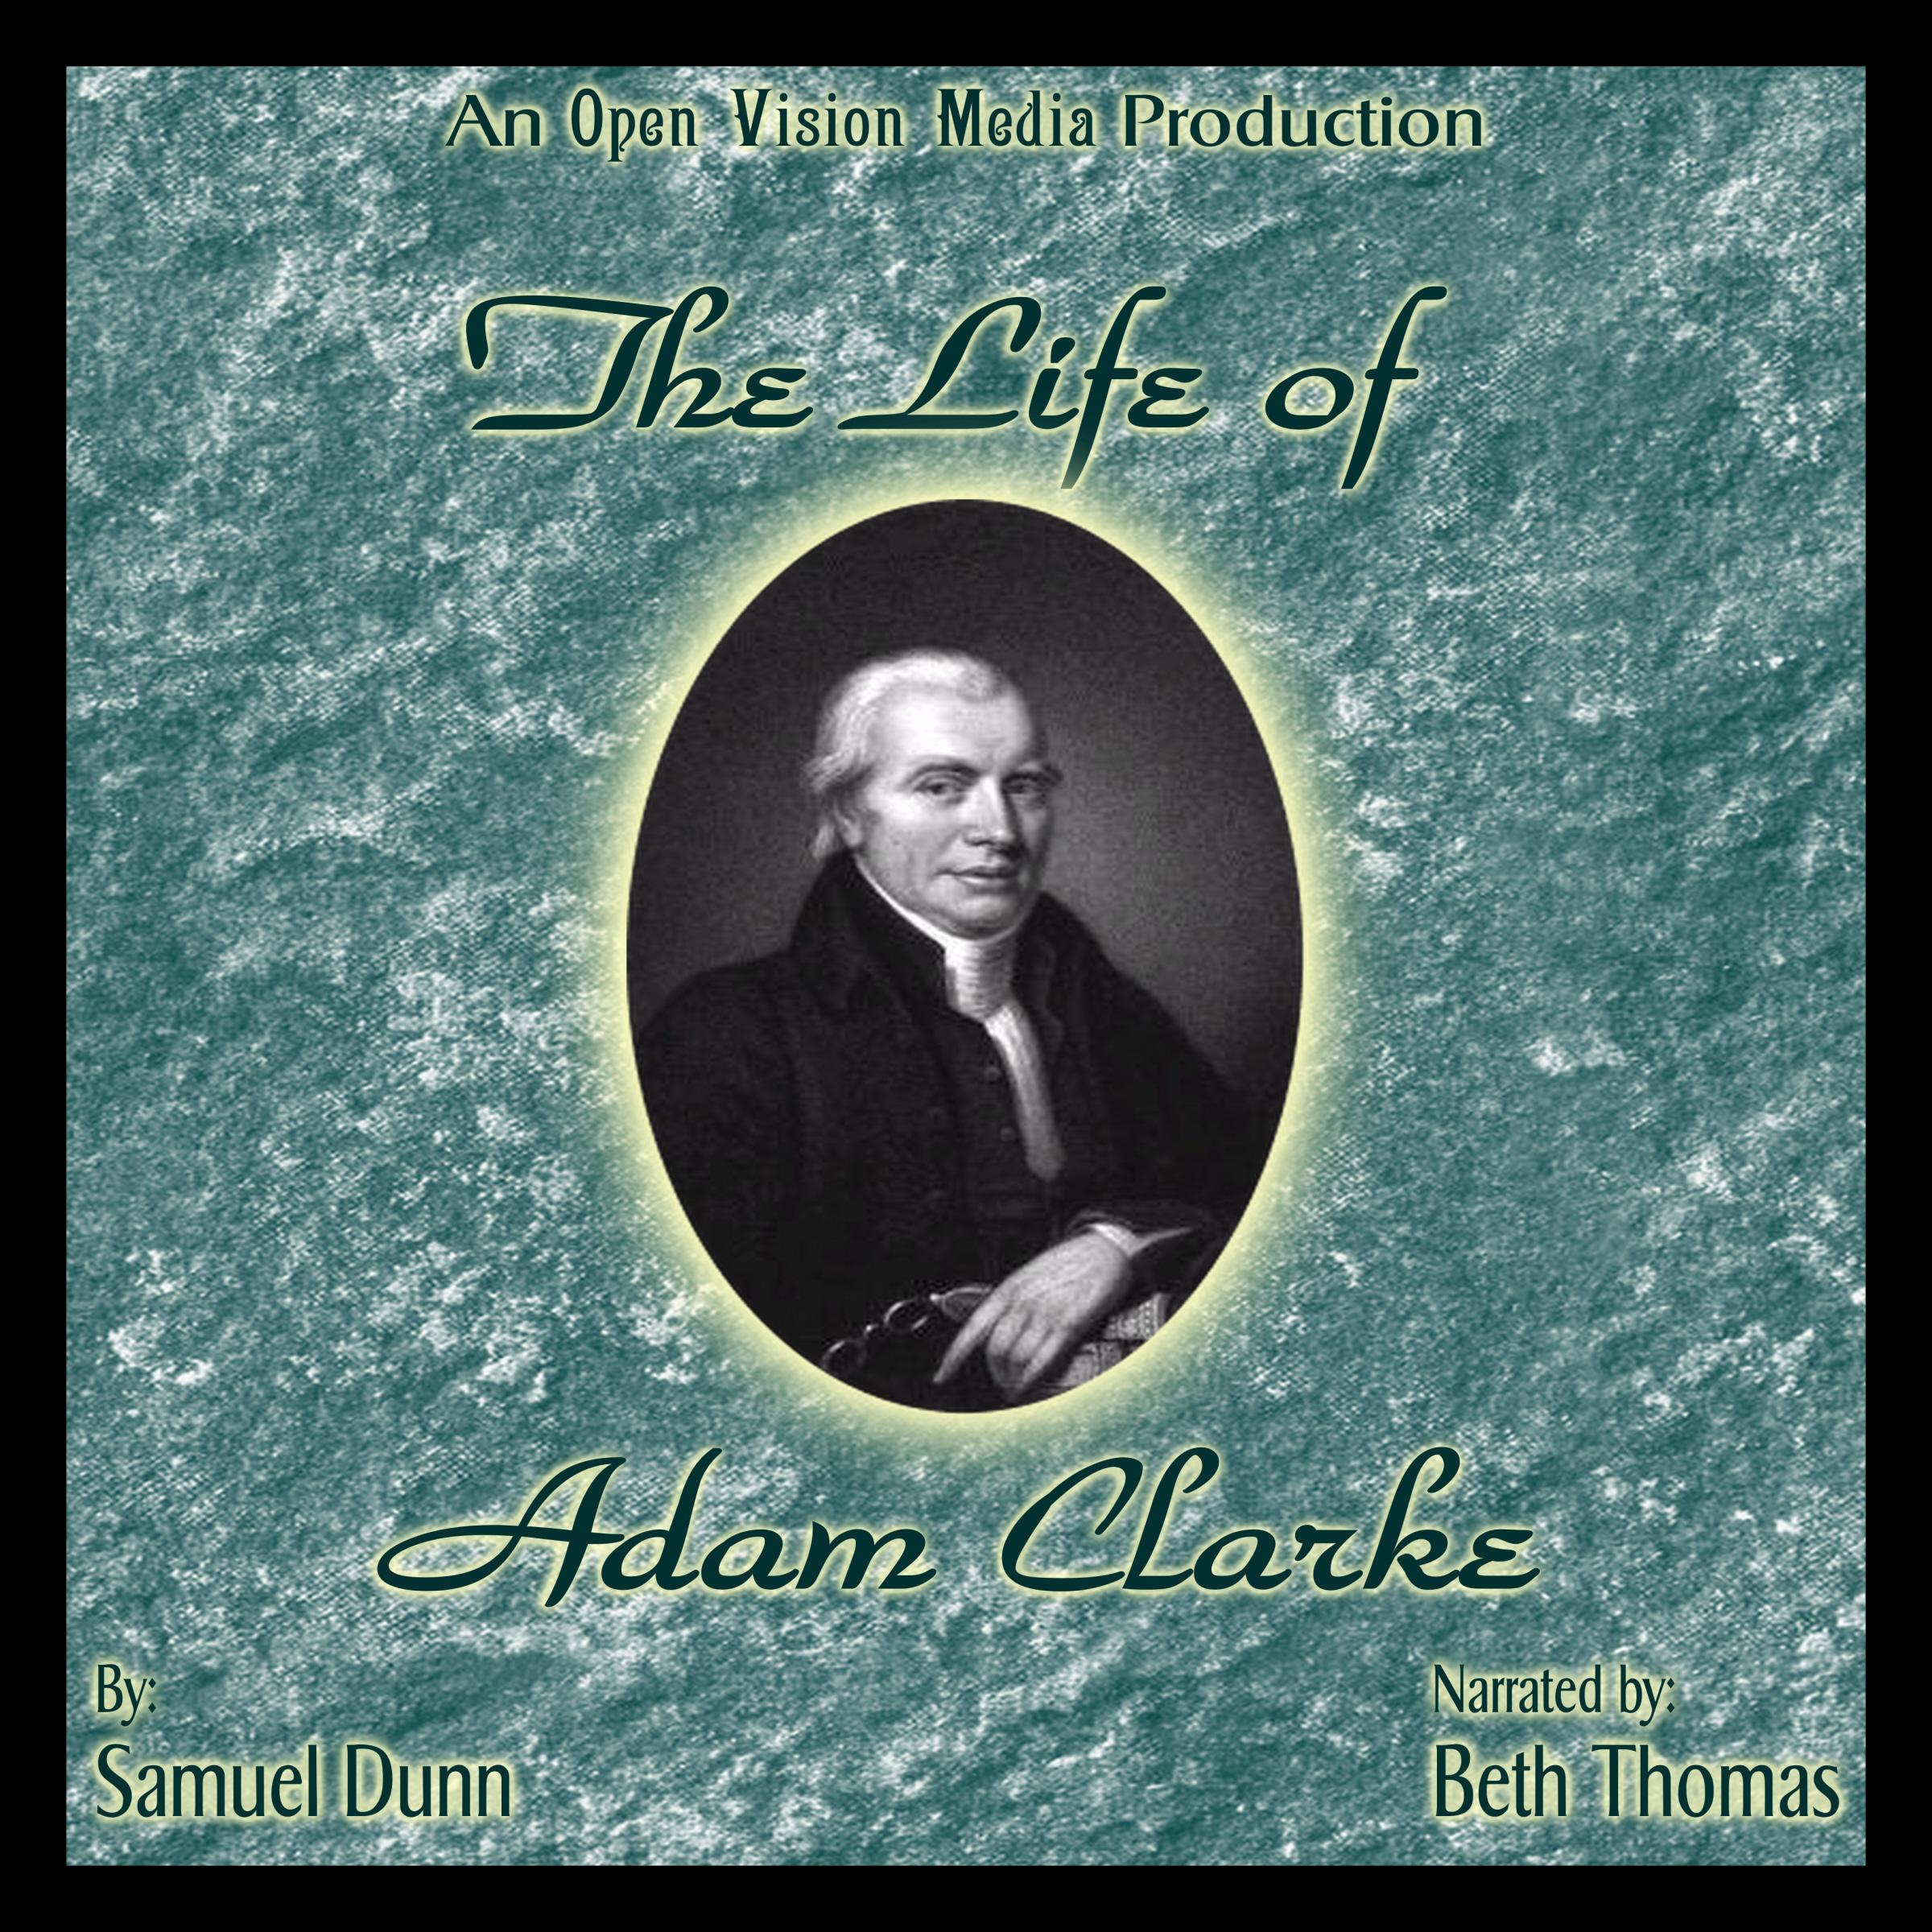 The Life of Adam Clarke